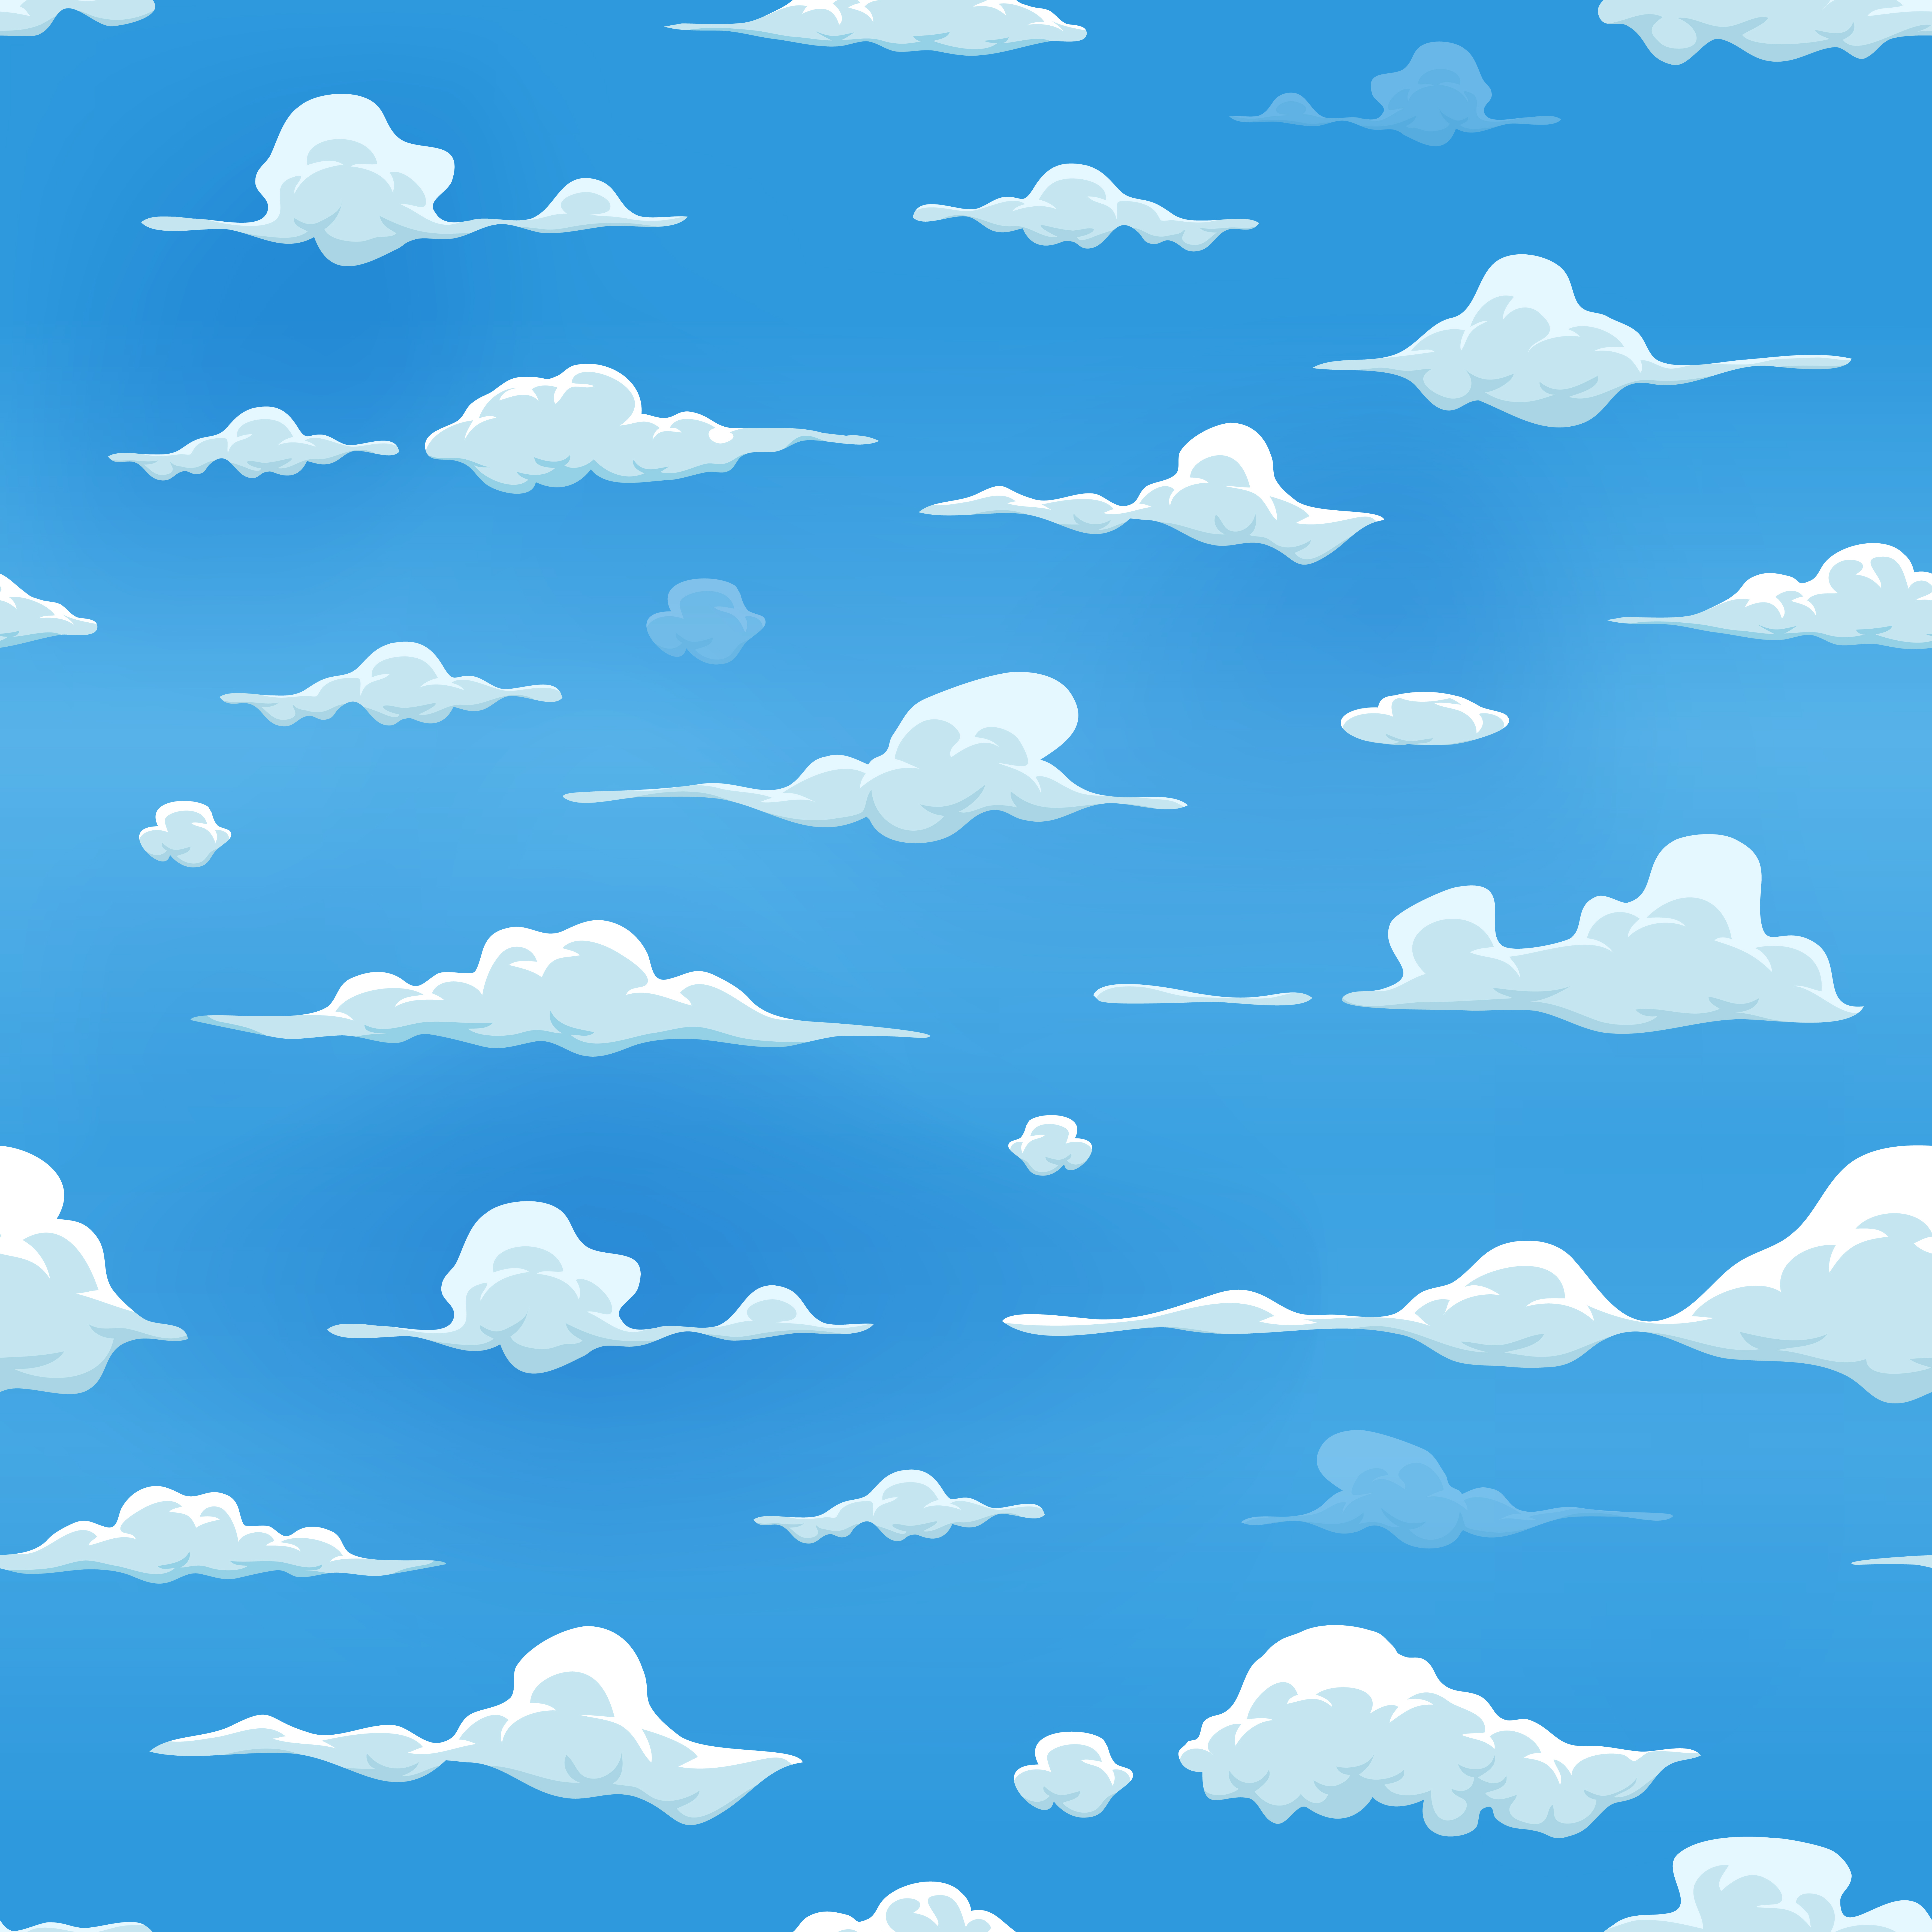 Download 105 Background Blue Cartoon Paling Keren